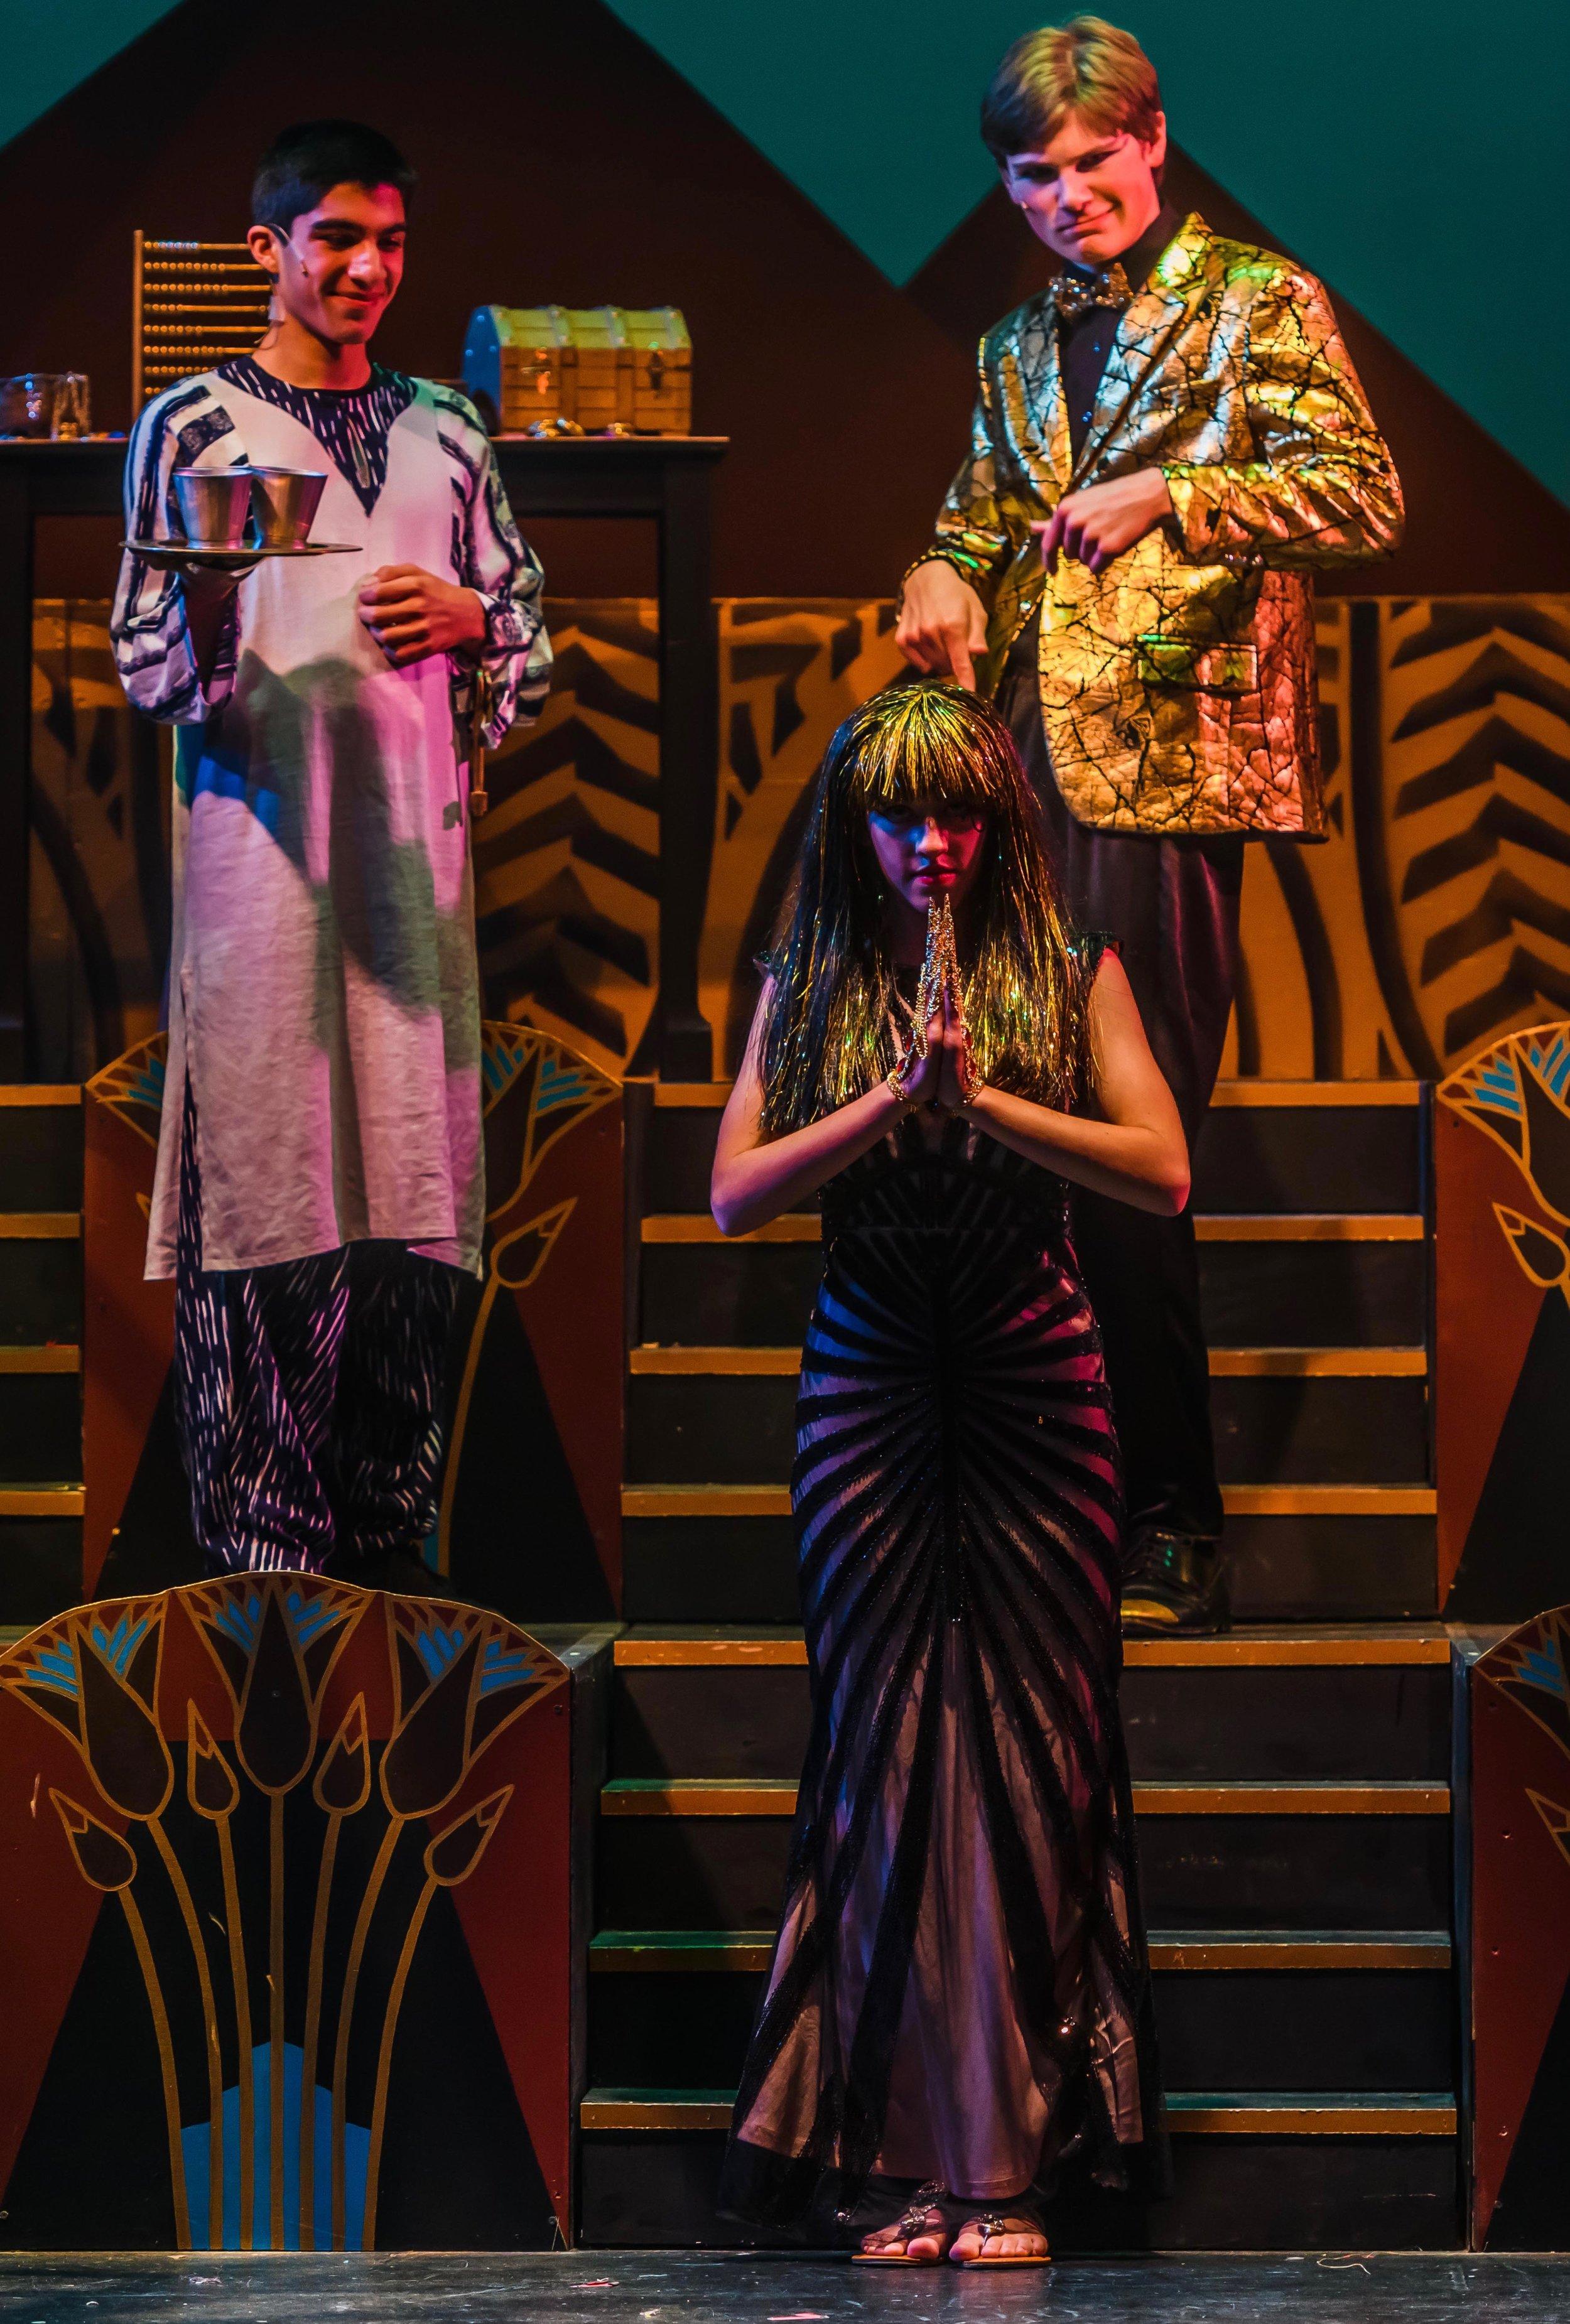 Joseph and the Amazing Technicolor Dreamcoat photos by Ravi Kohli (783).jpeg